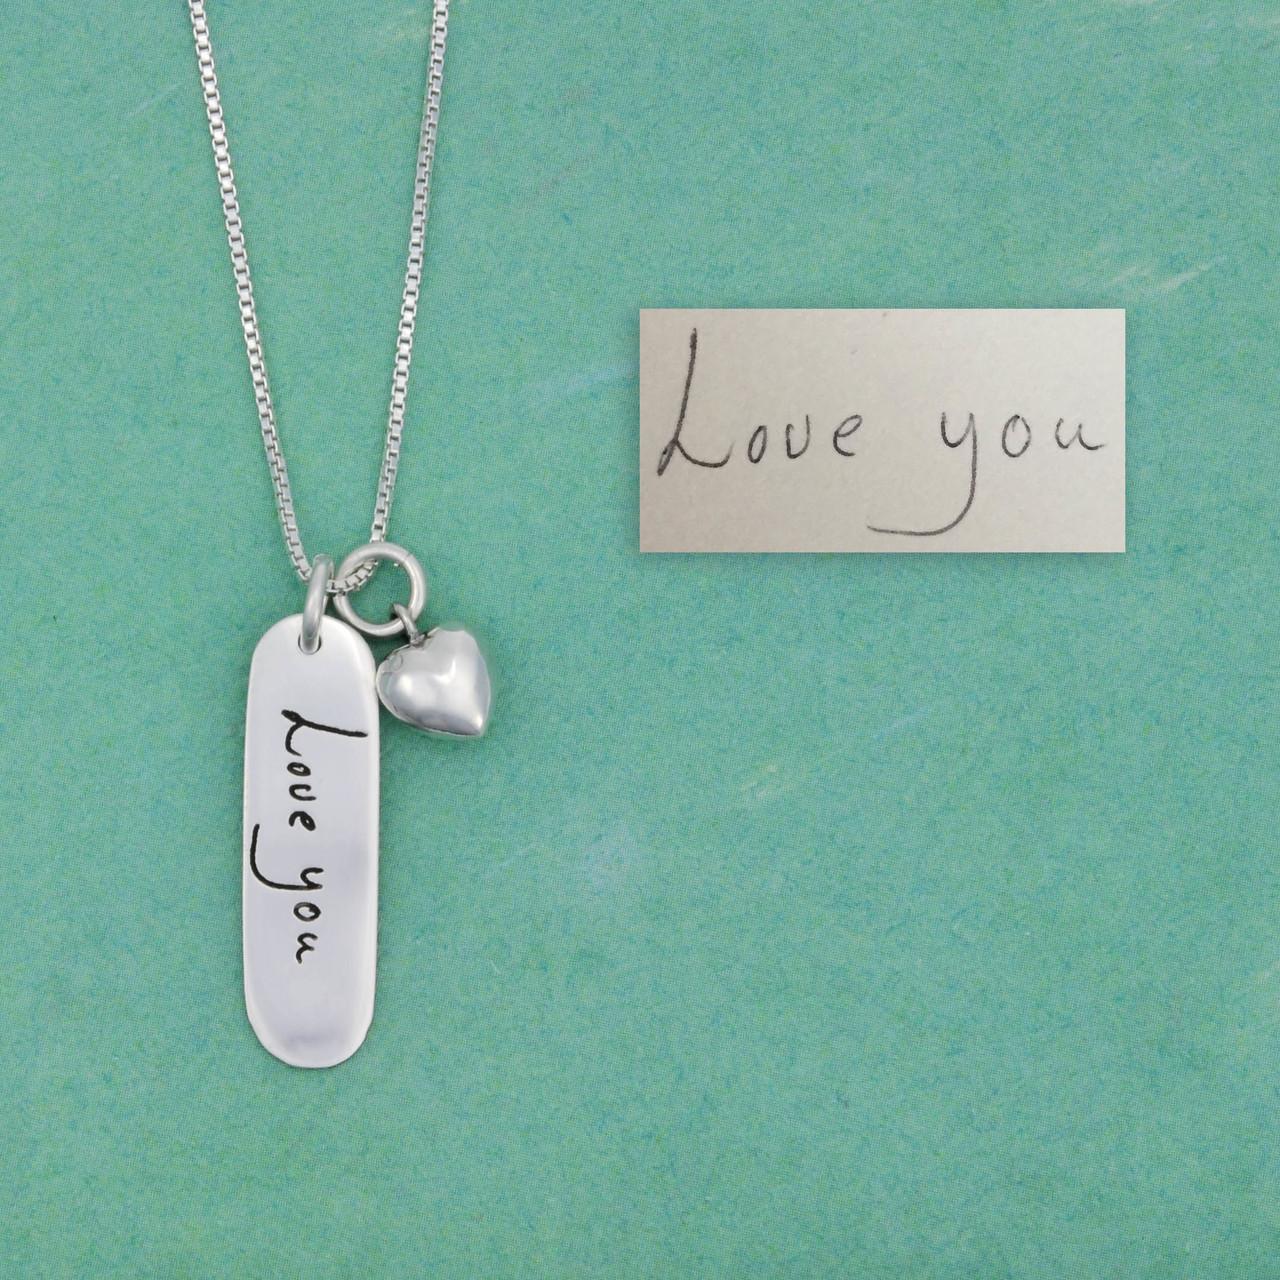 Handwriting memorial necklace